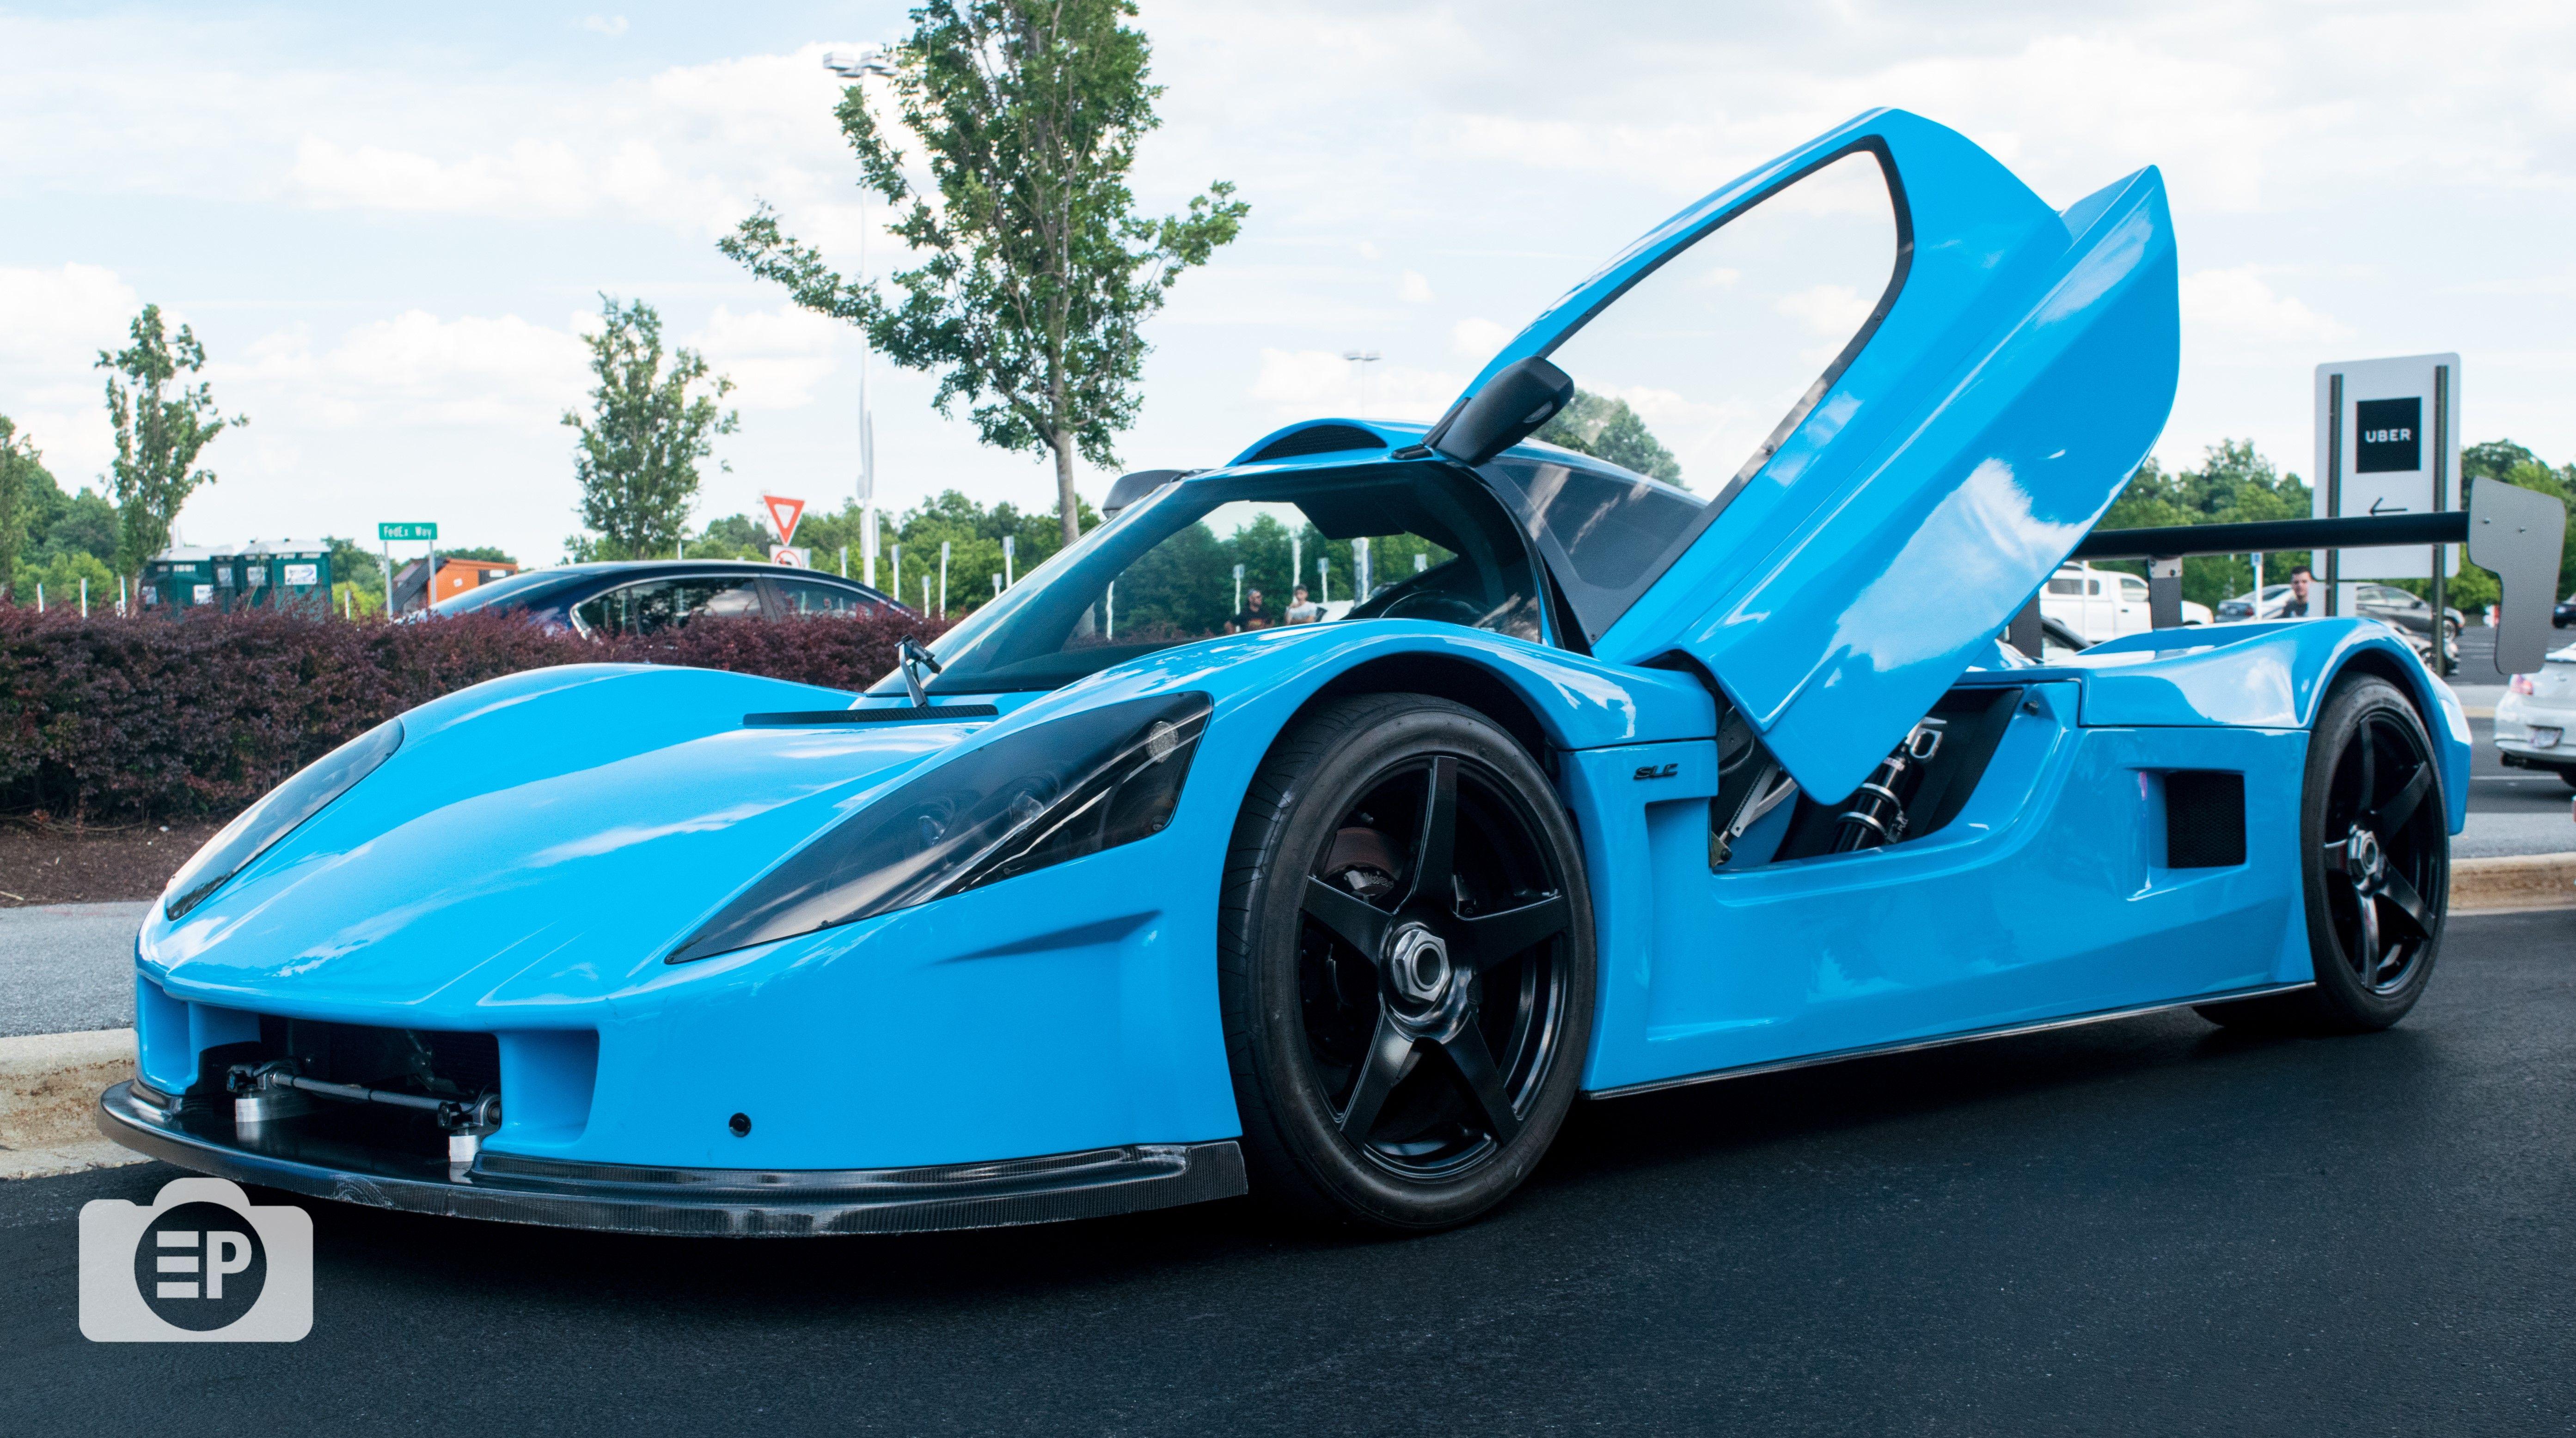 Slc Kit Car >> Superlite Slc At Fedex Field Superlite Slc Exotic Sports Cars